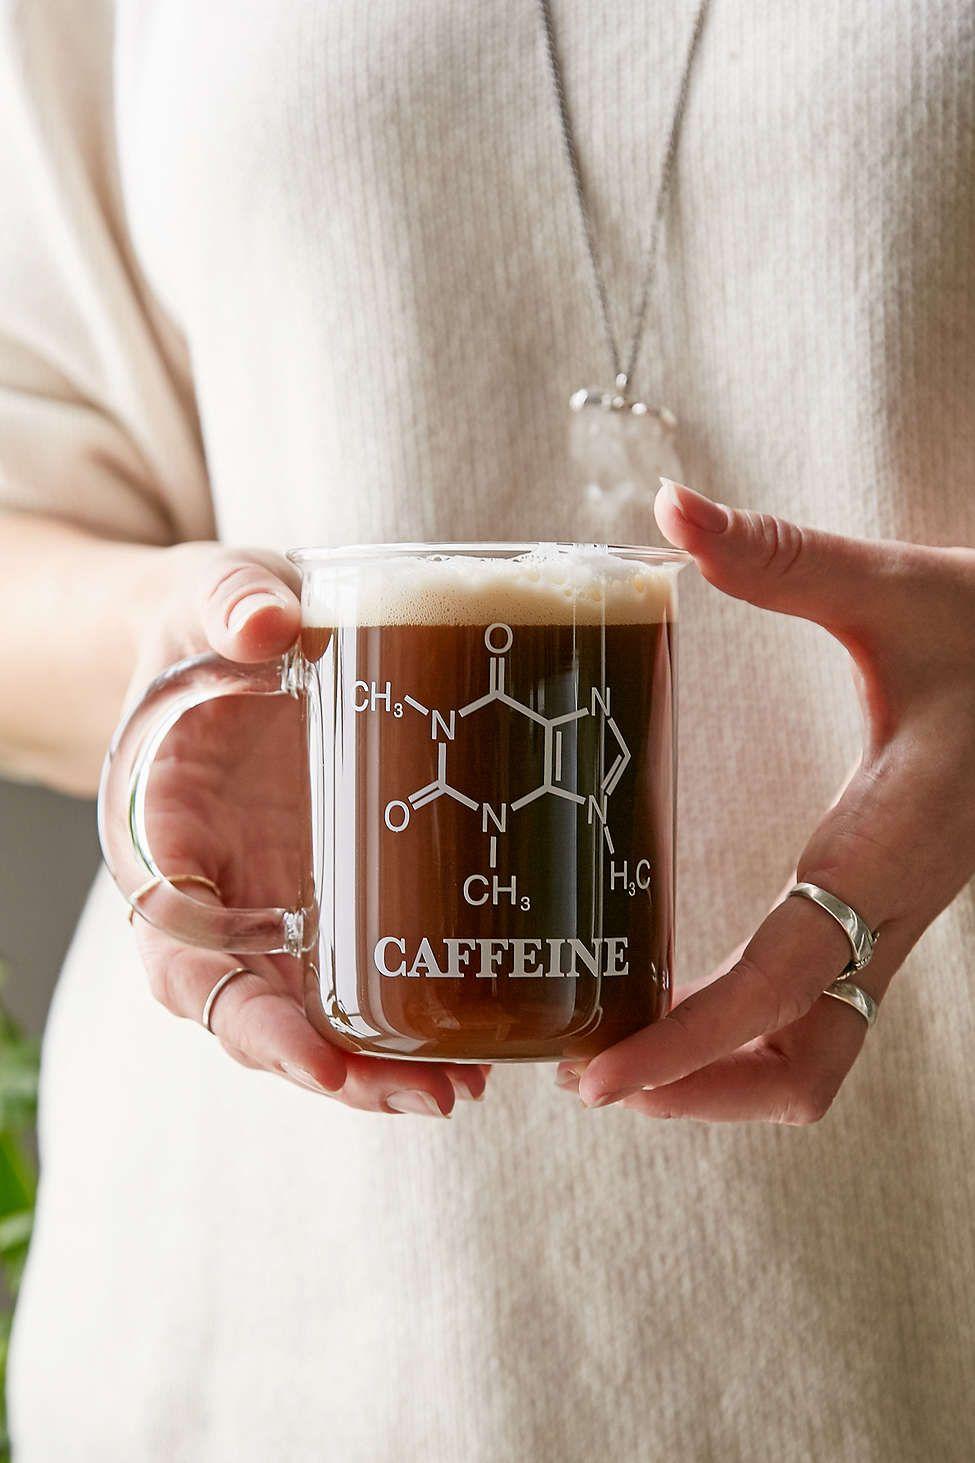 Chemistry Mug Brings out the science nerd in me.